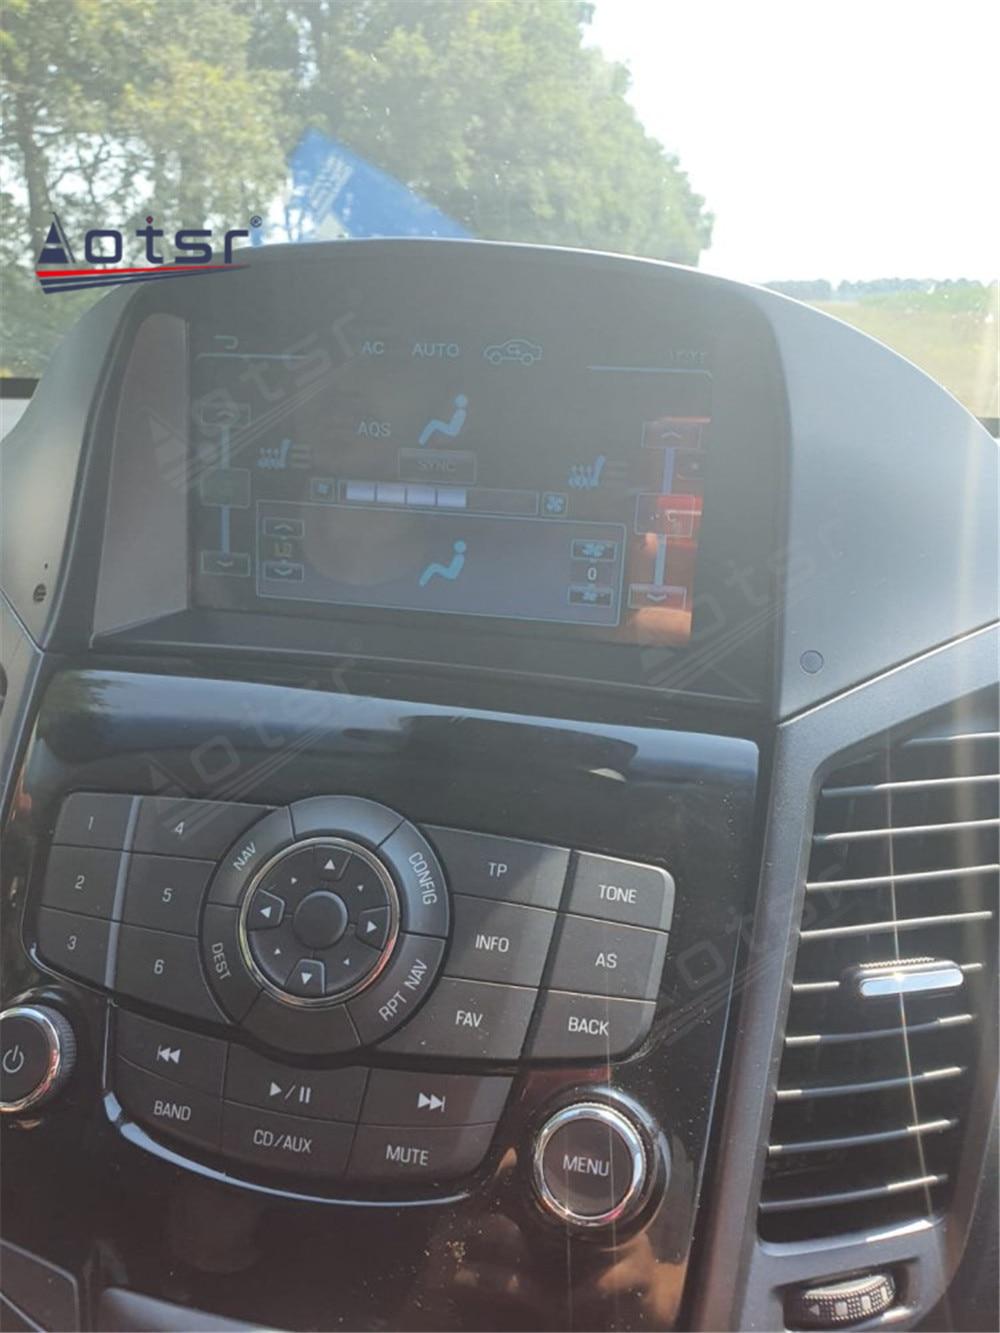 AOTSR سيارة مشغل وسائط متعددة أندرويد 10.0 لشروليه أورلاندو 2011 2012 2013 - 2015 لتحديد المواقع والملاحة راديو تلقائي DSP واي فاي ستيريو